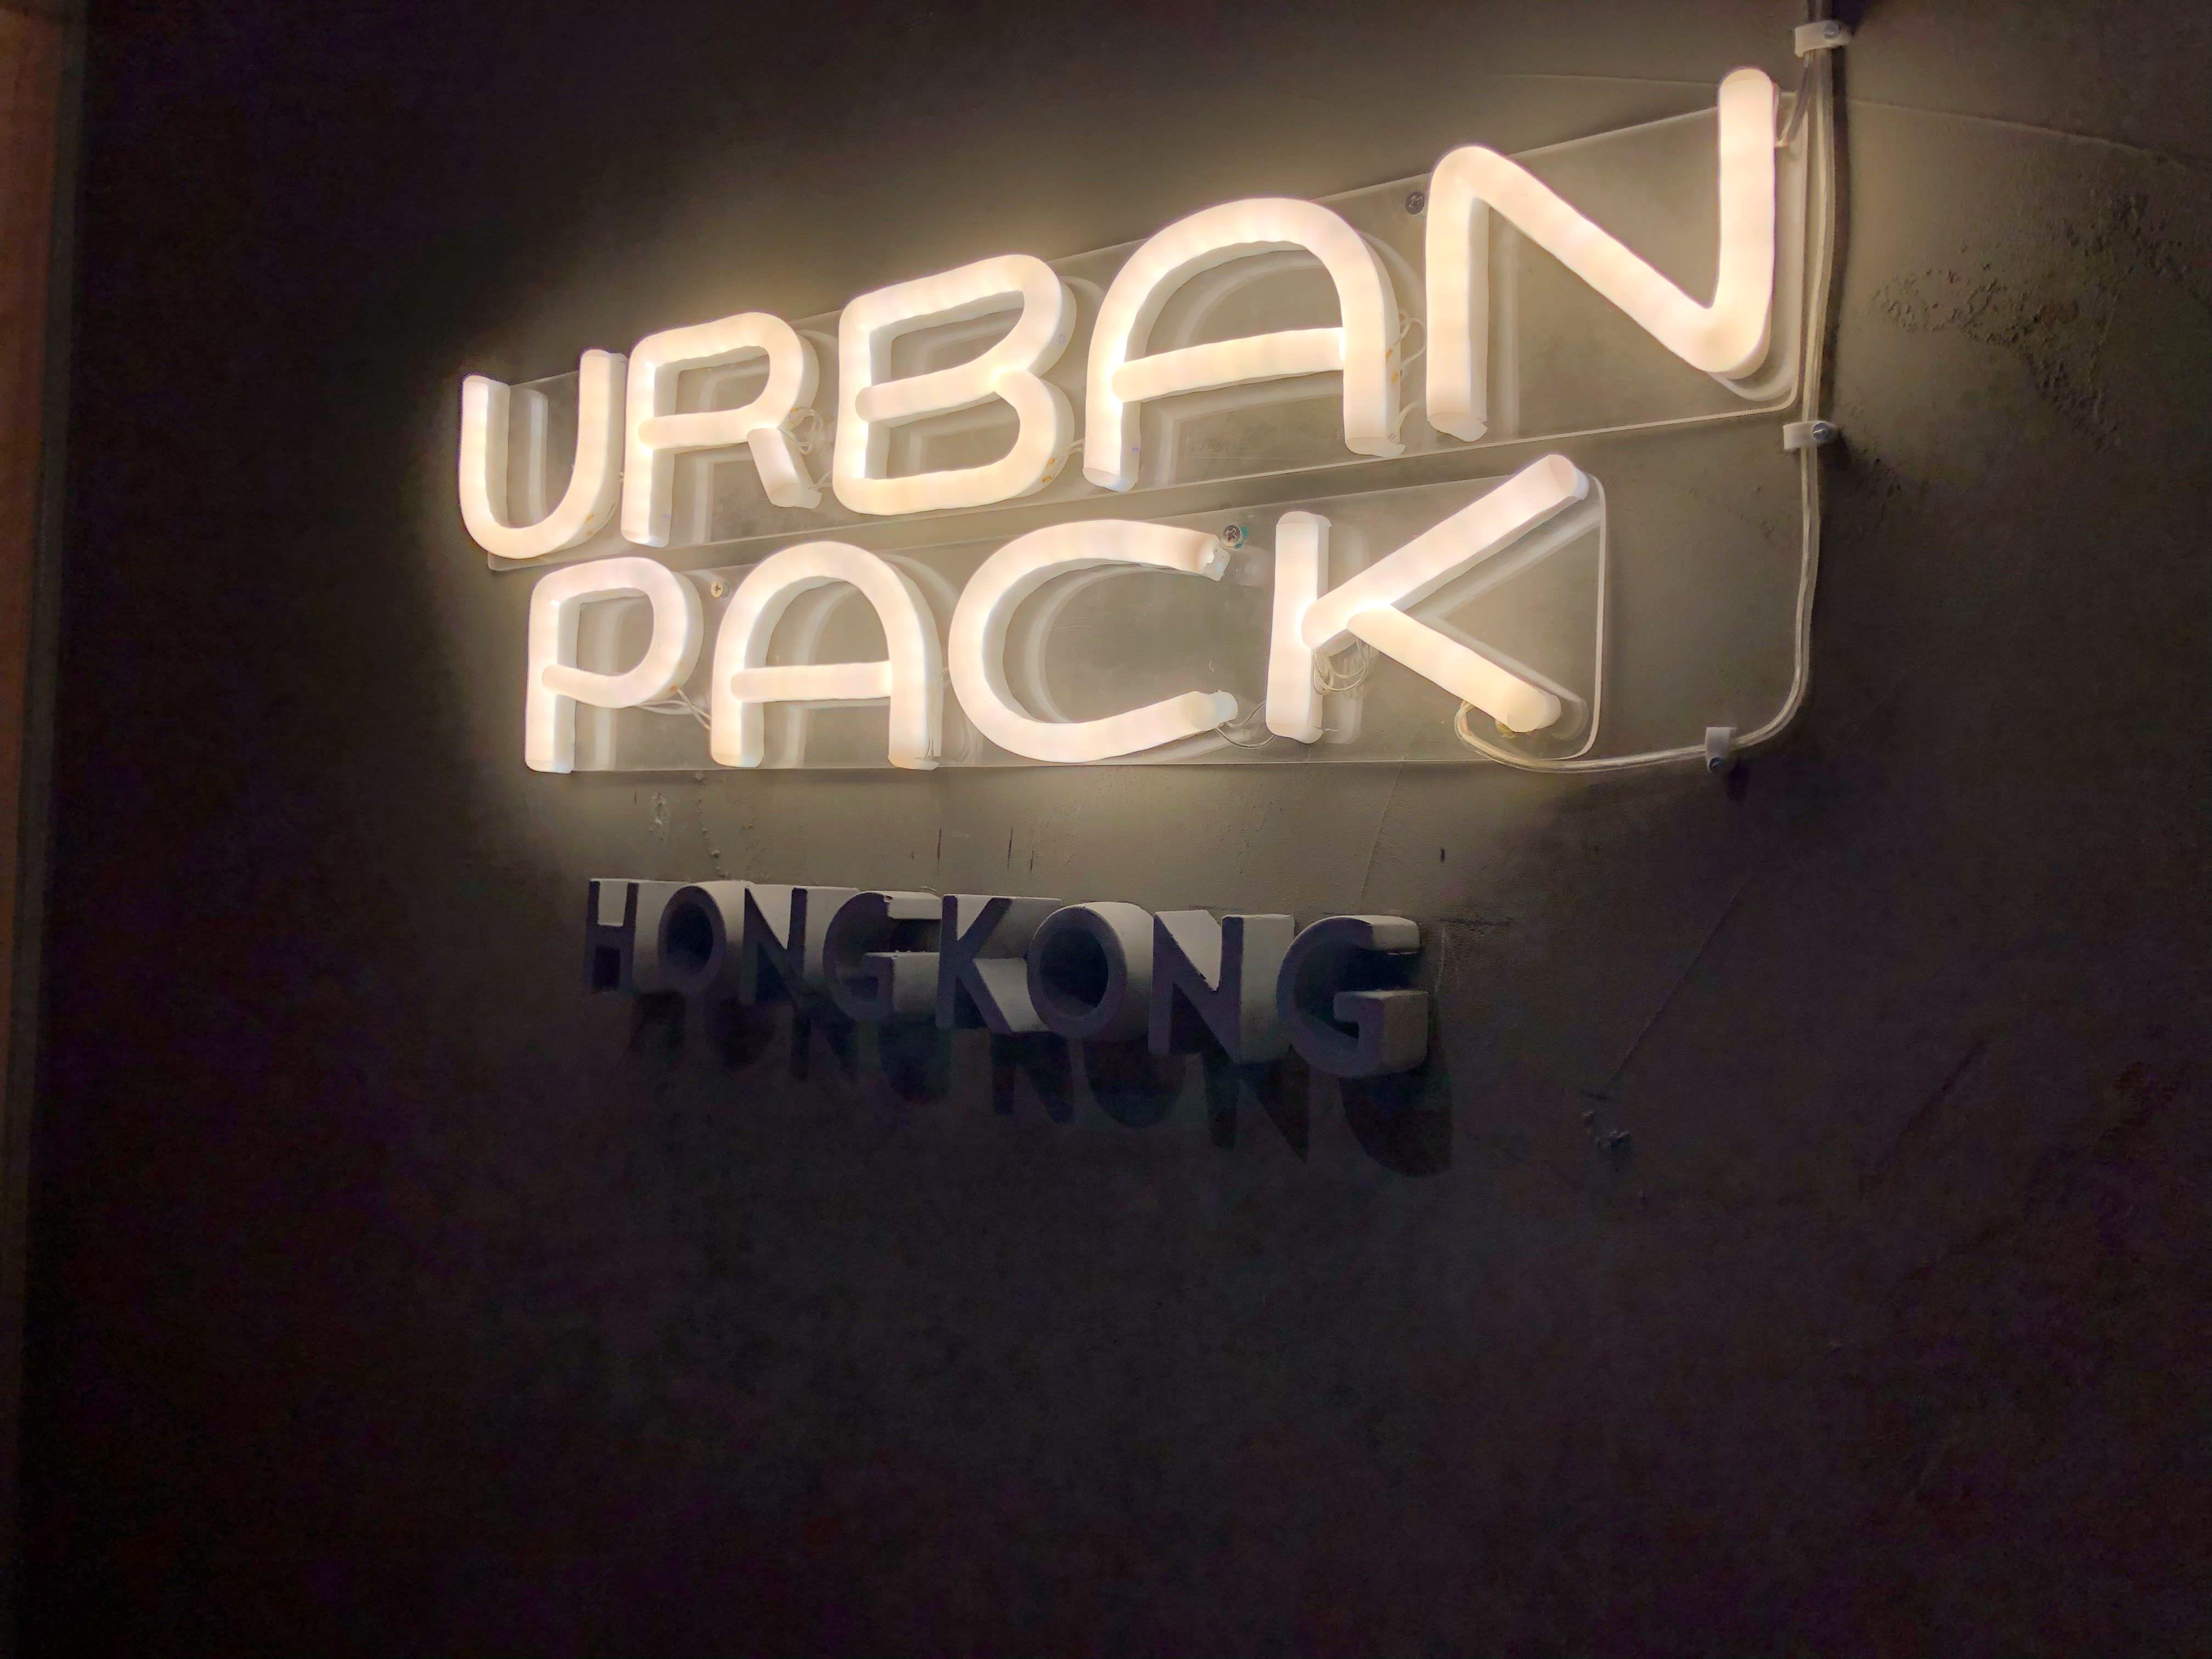 HOSTEL - Urban Pack